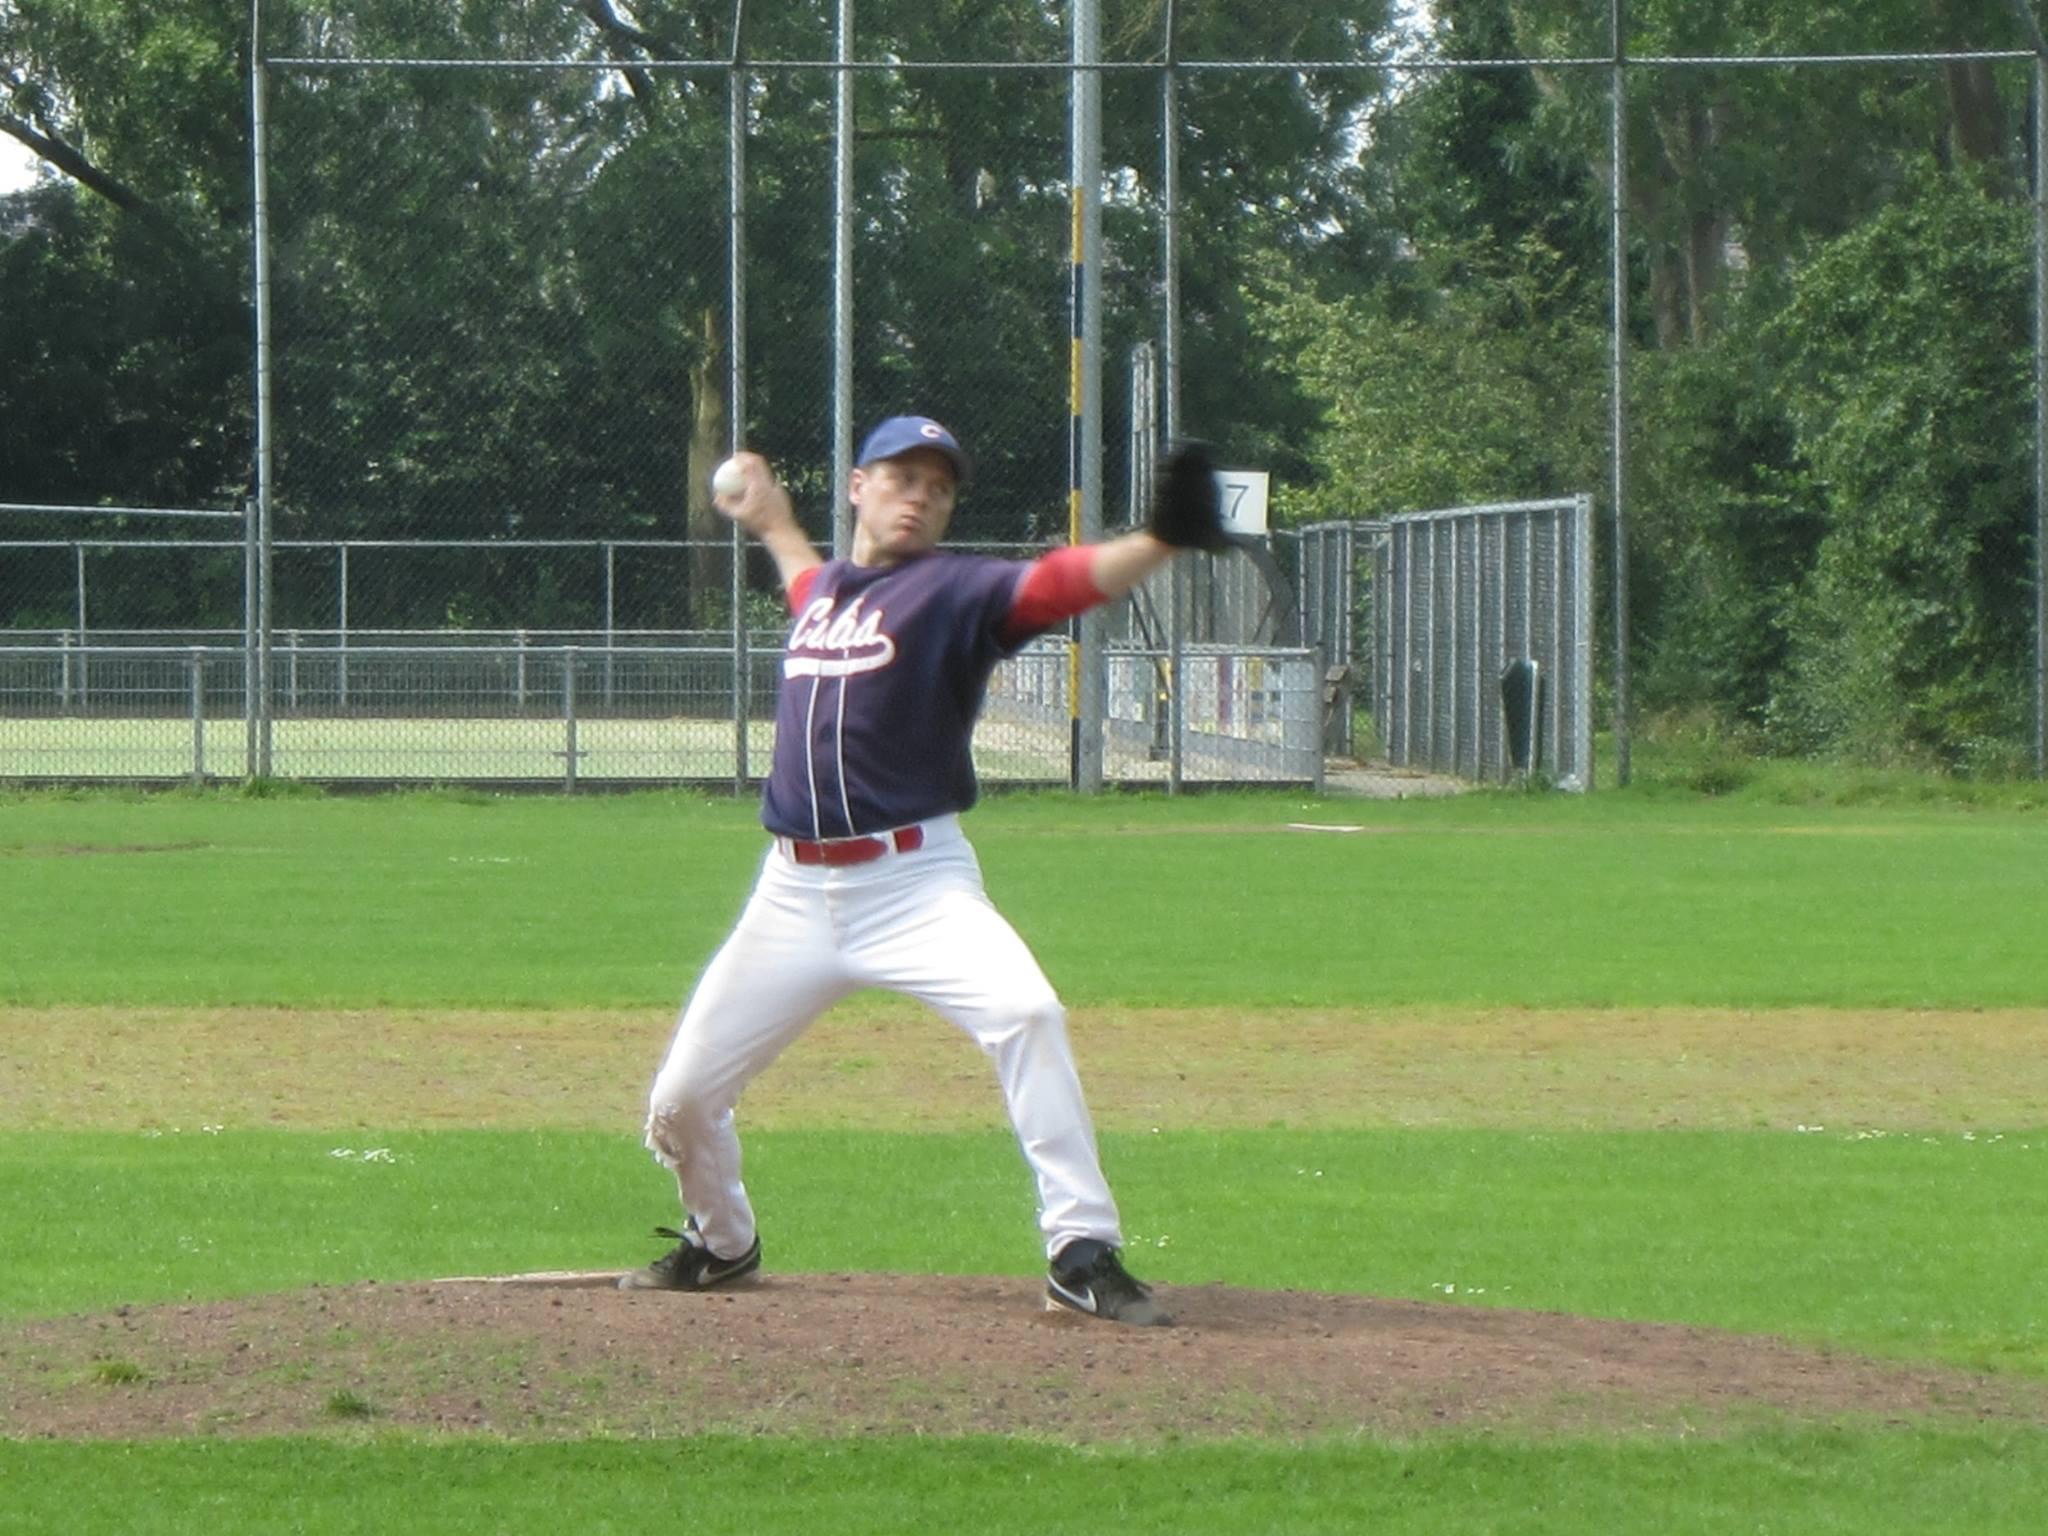 Honkbal Hardenberg Pitcher Arne Hoek in actie tegen Northern stars